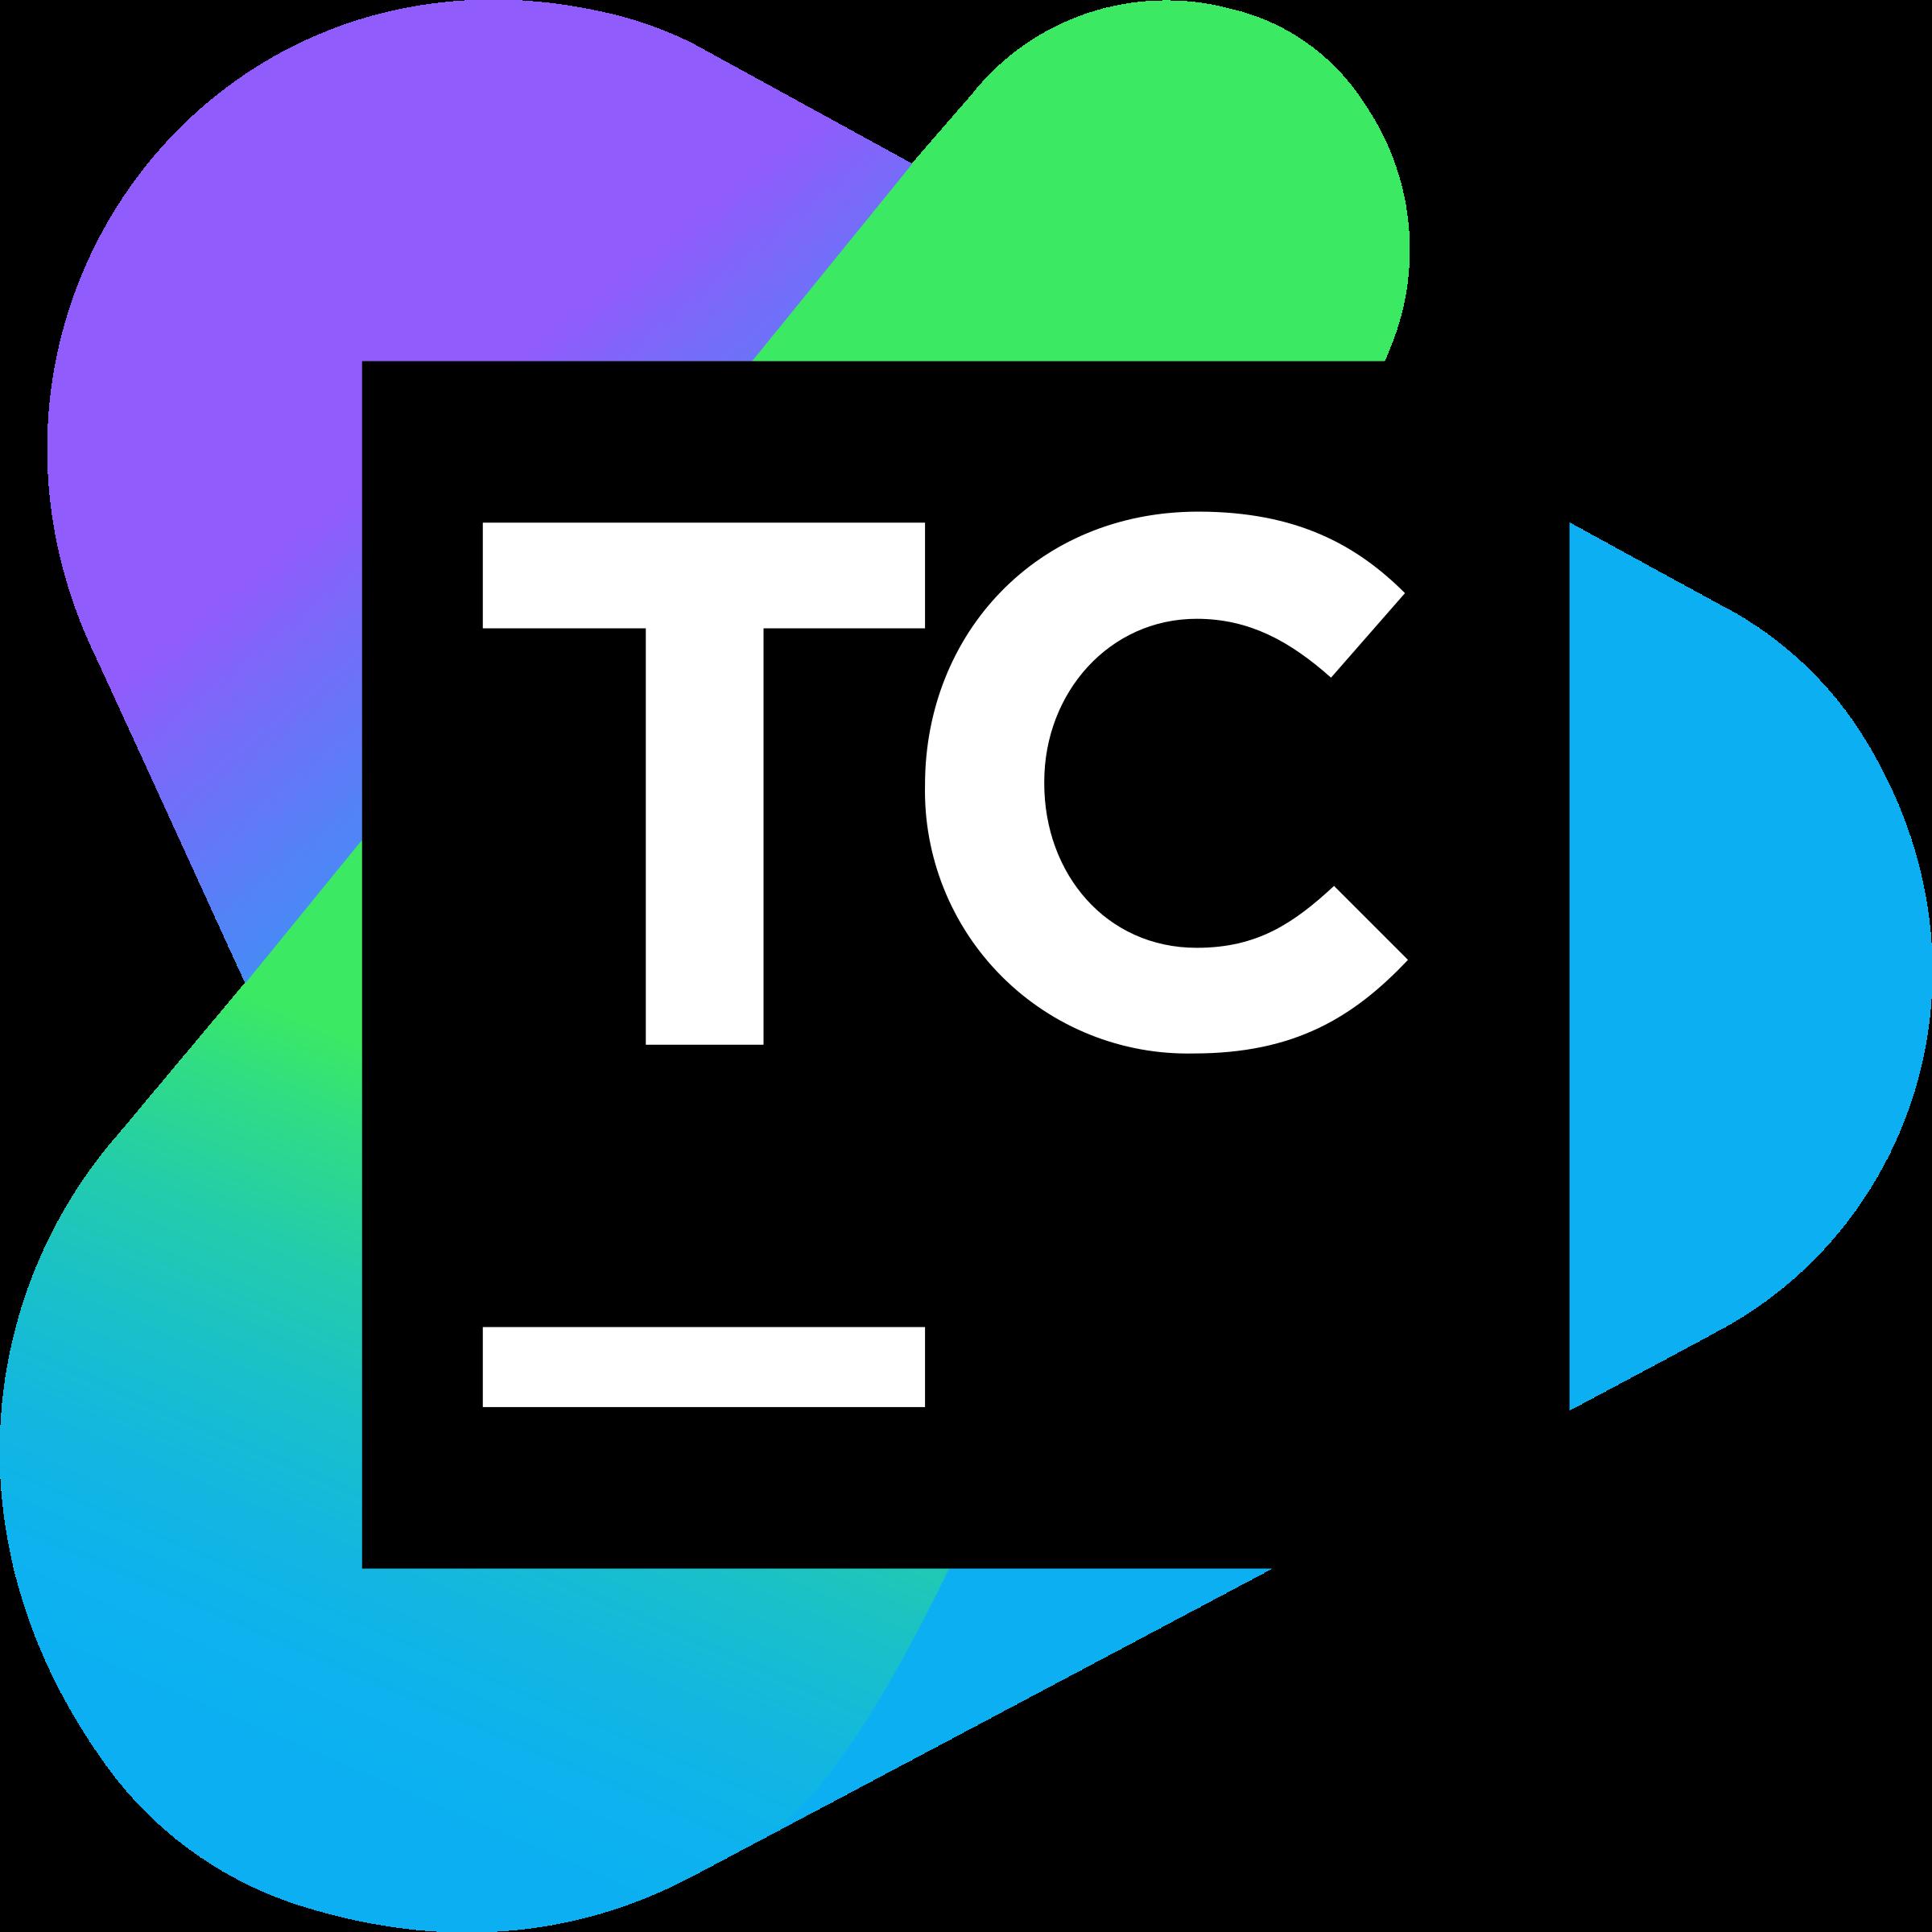 teamcity-icon-logo-png-transparent.png